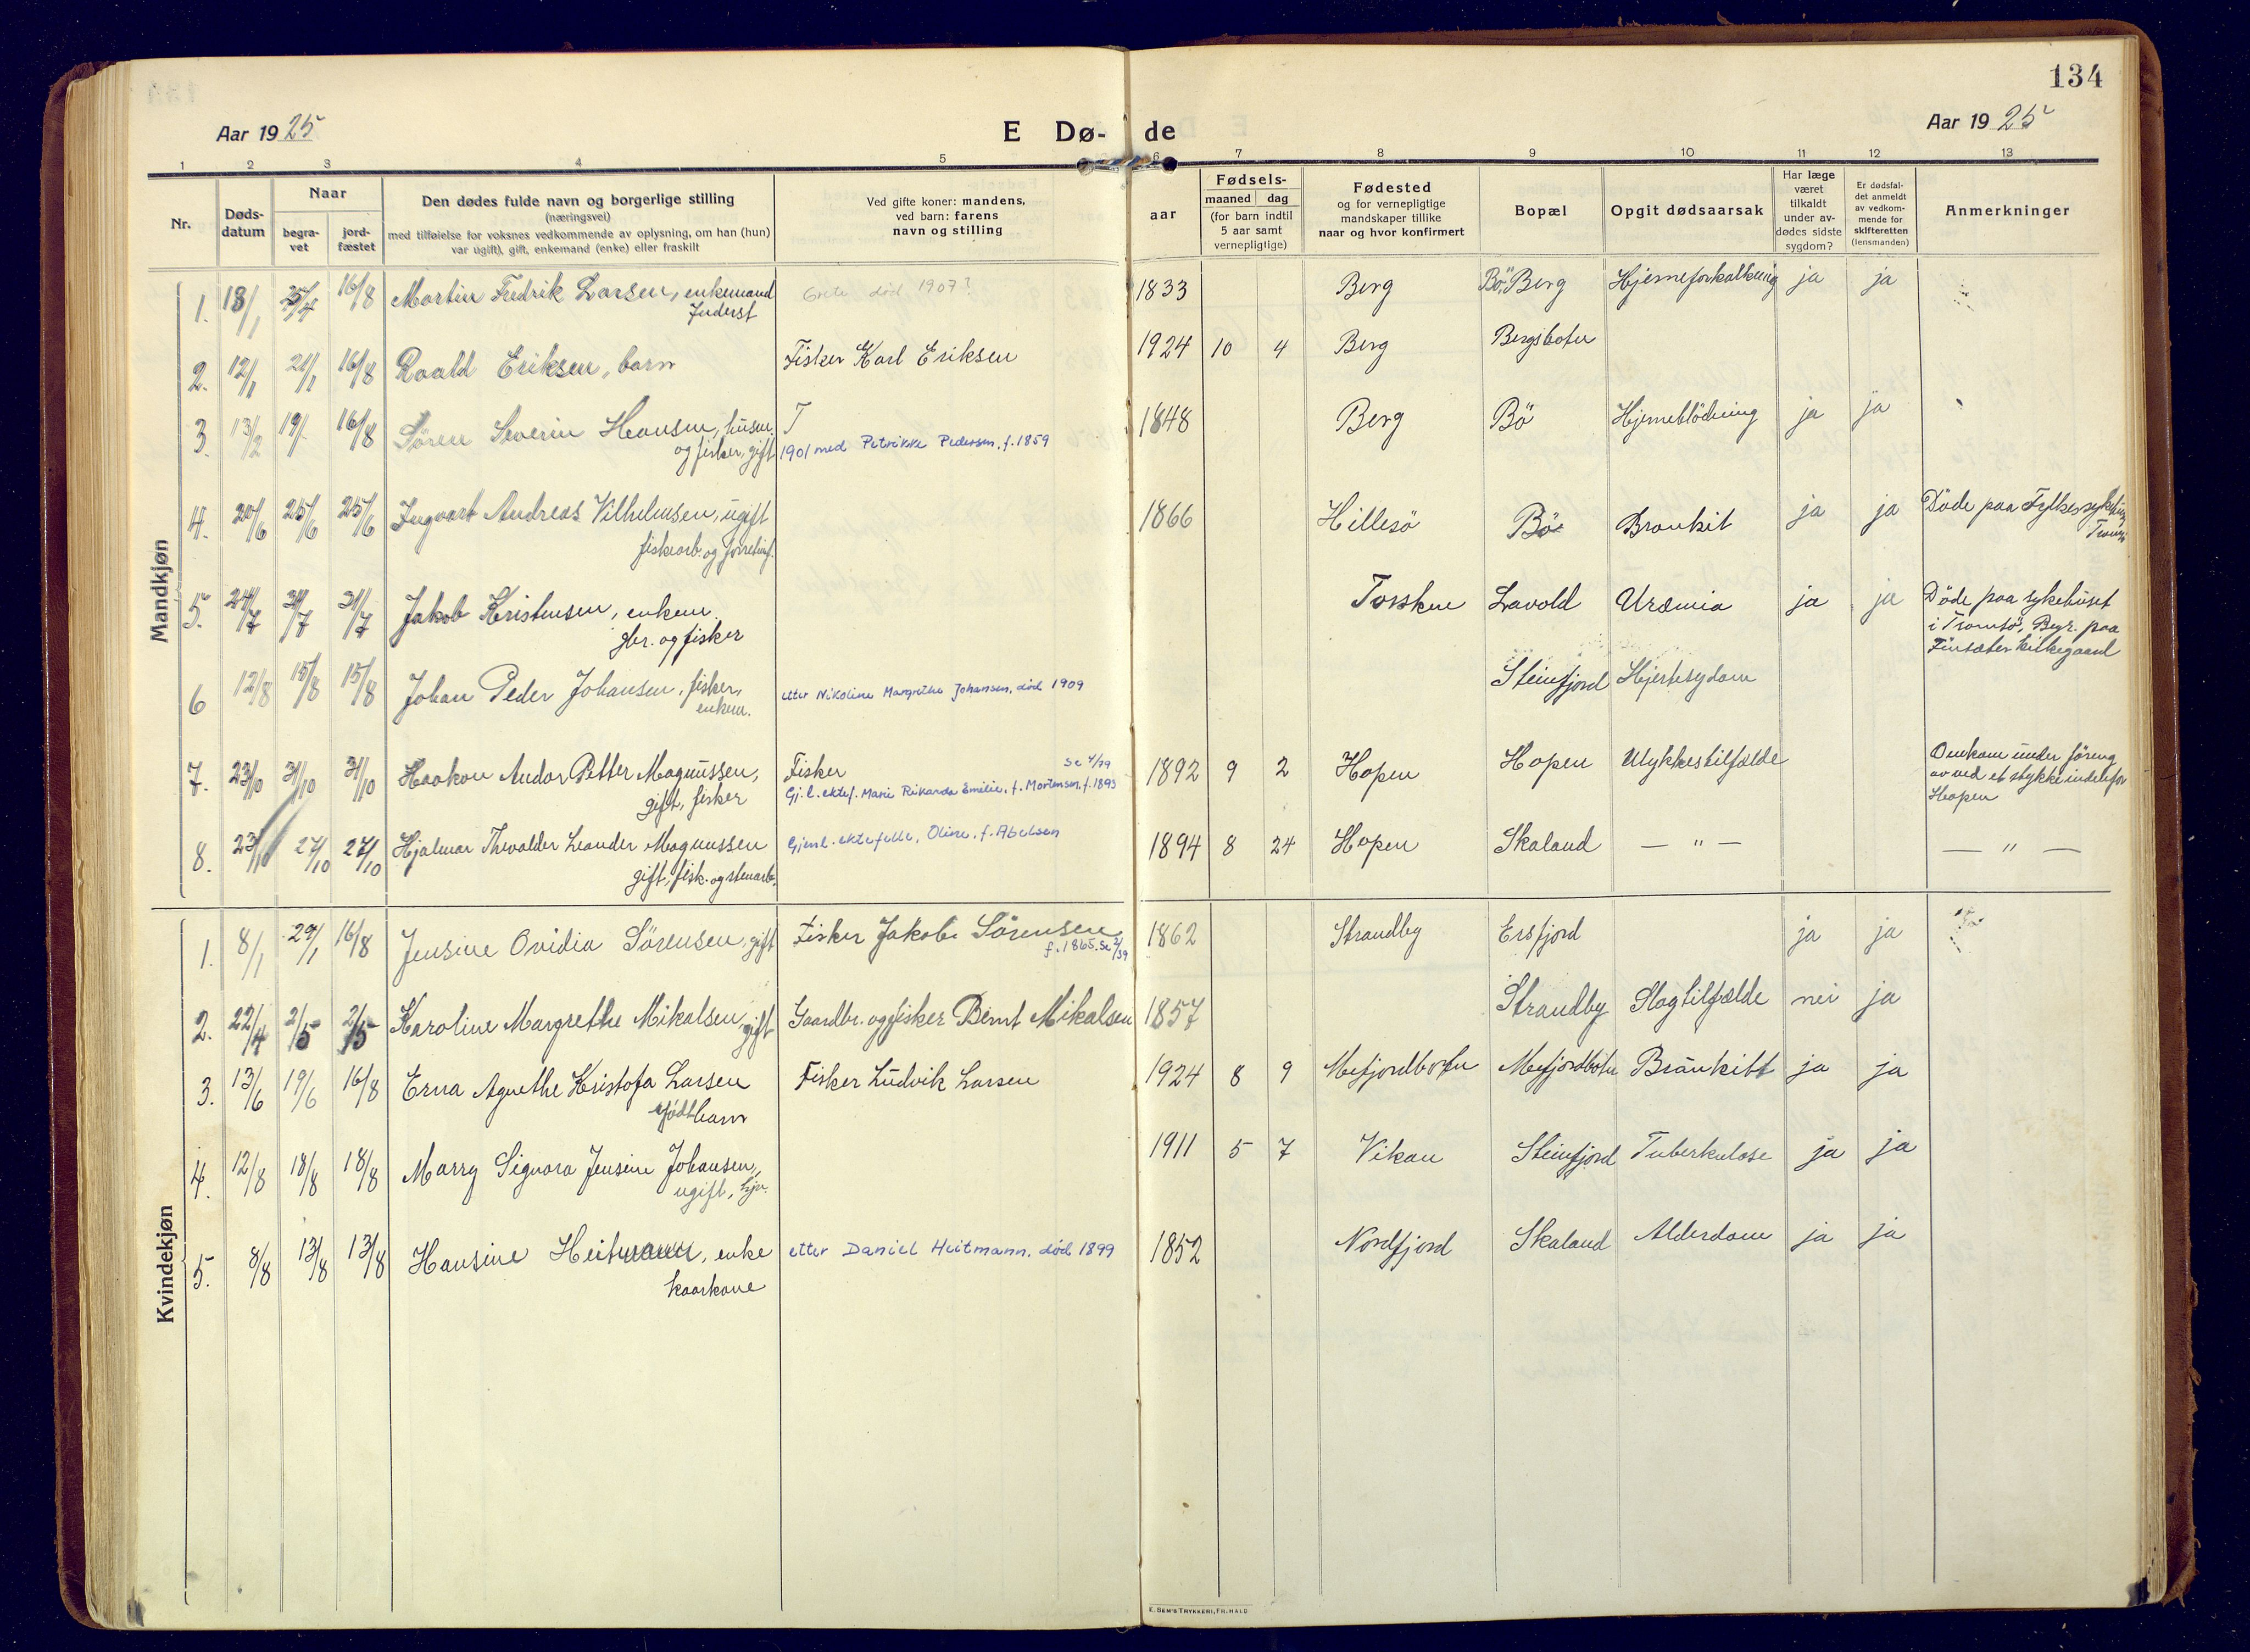 SATØ, Mefjord/Berg sokneprestkontor, G/Ga/Gaa: Ministerialbok nr. 9, 1916-1928, s. 134